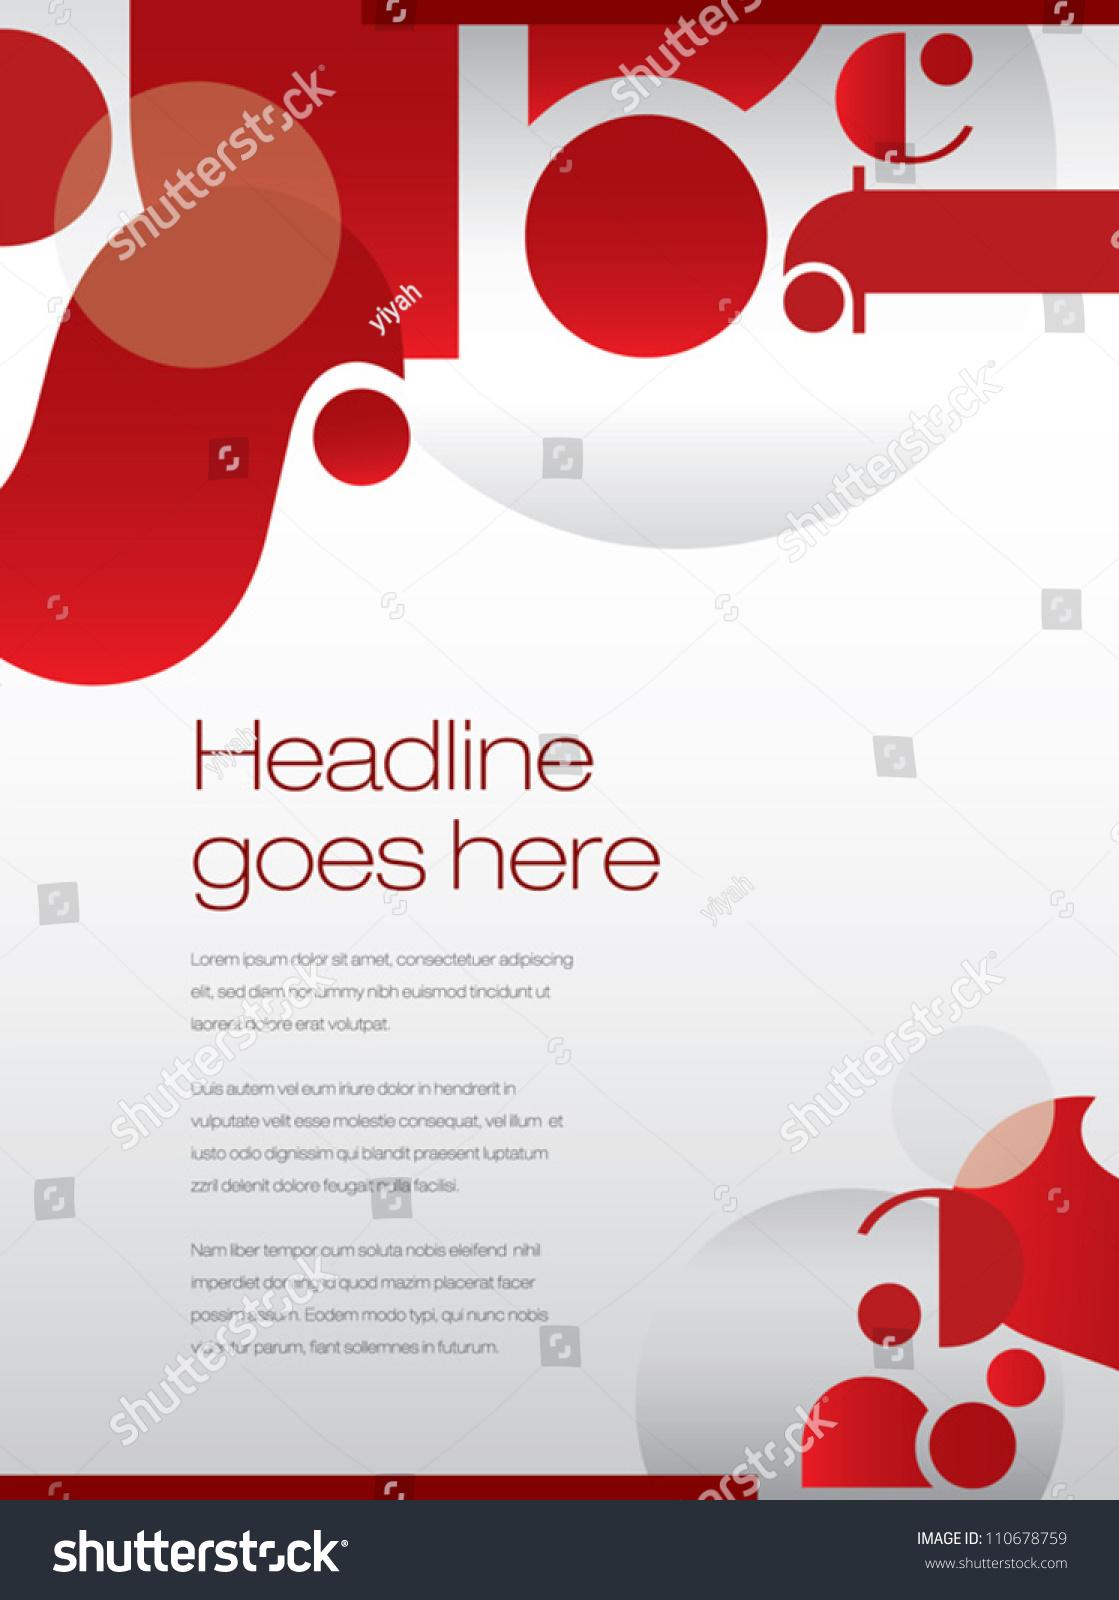 printposterbackgrounddesign layoutgraphics stock vector